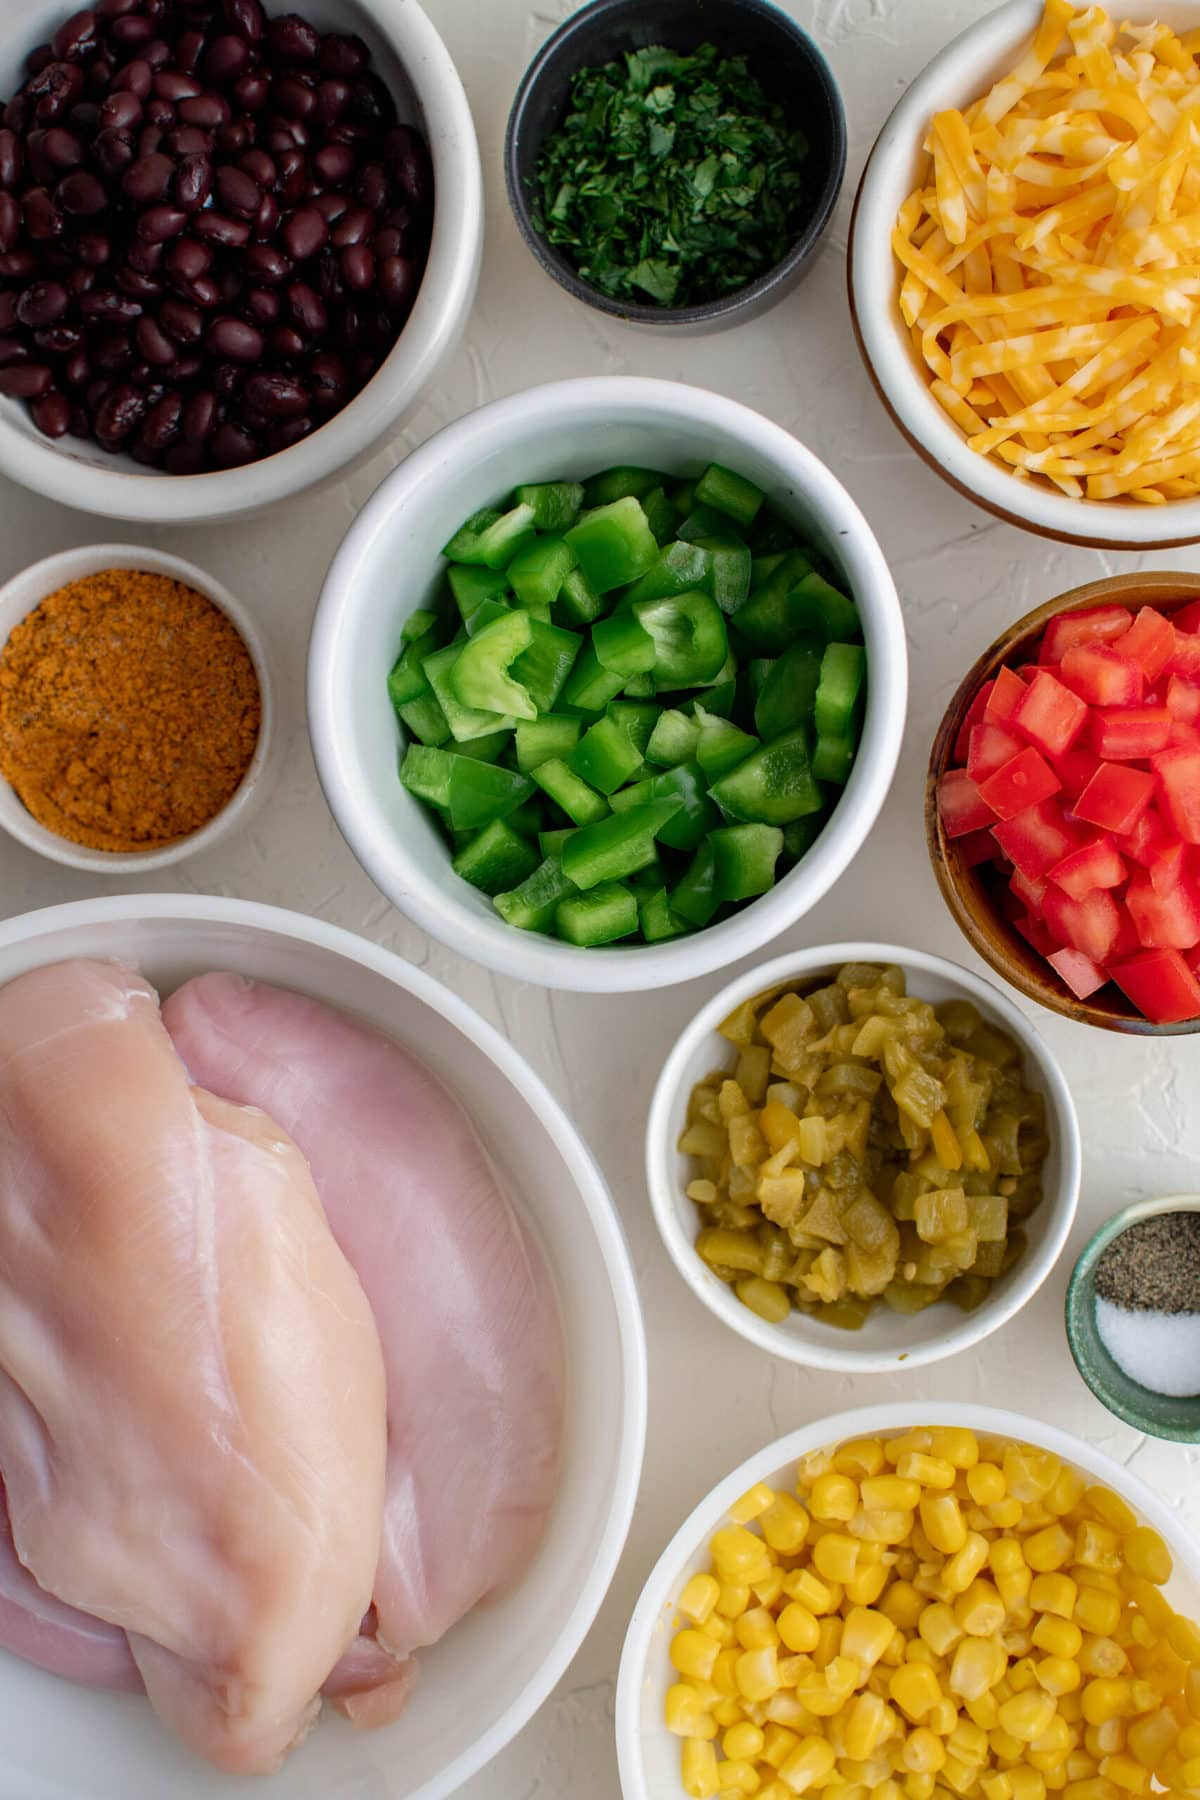 ingredients to make southwest chicken bake